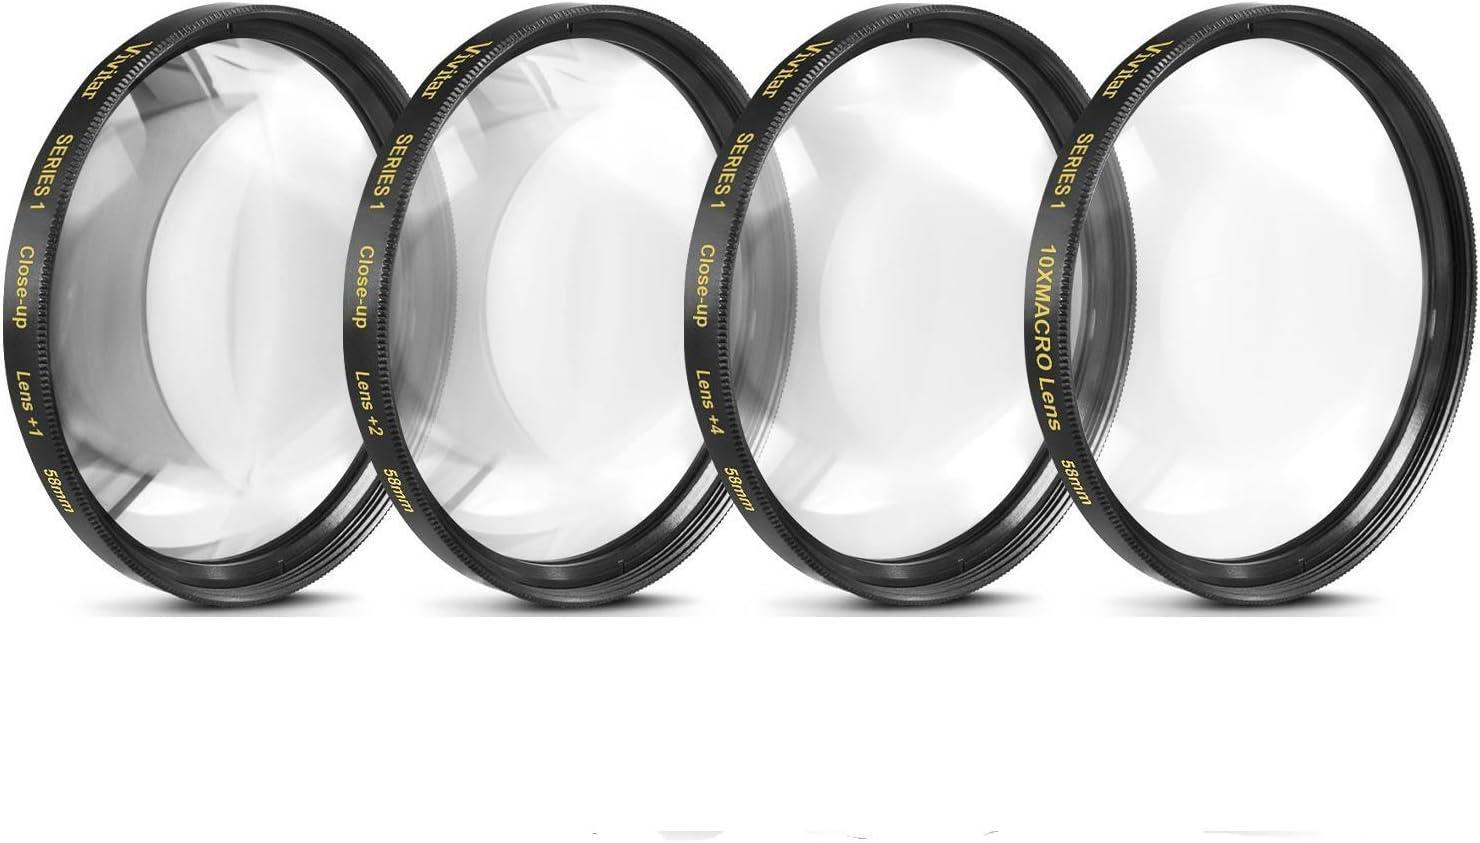 C-PL For Fujifilm XC 50-230mm f//4.5-6.7 OIS Circular Polarizer Multicoated Multithreaded Glass Filter 58mm